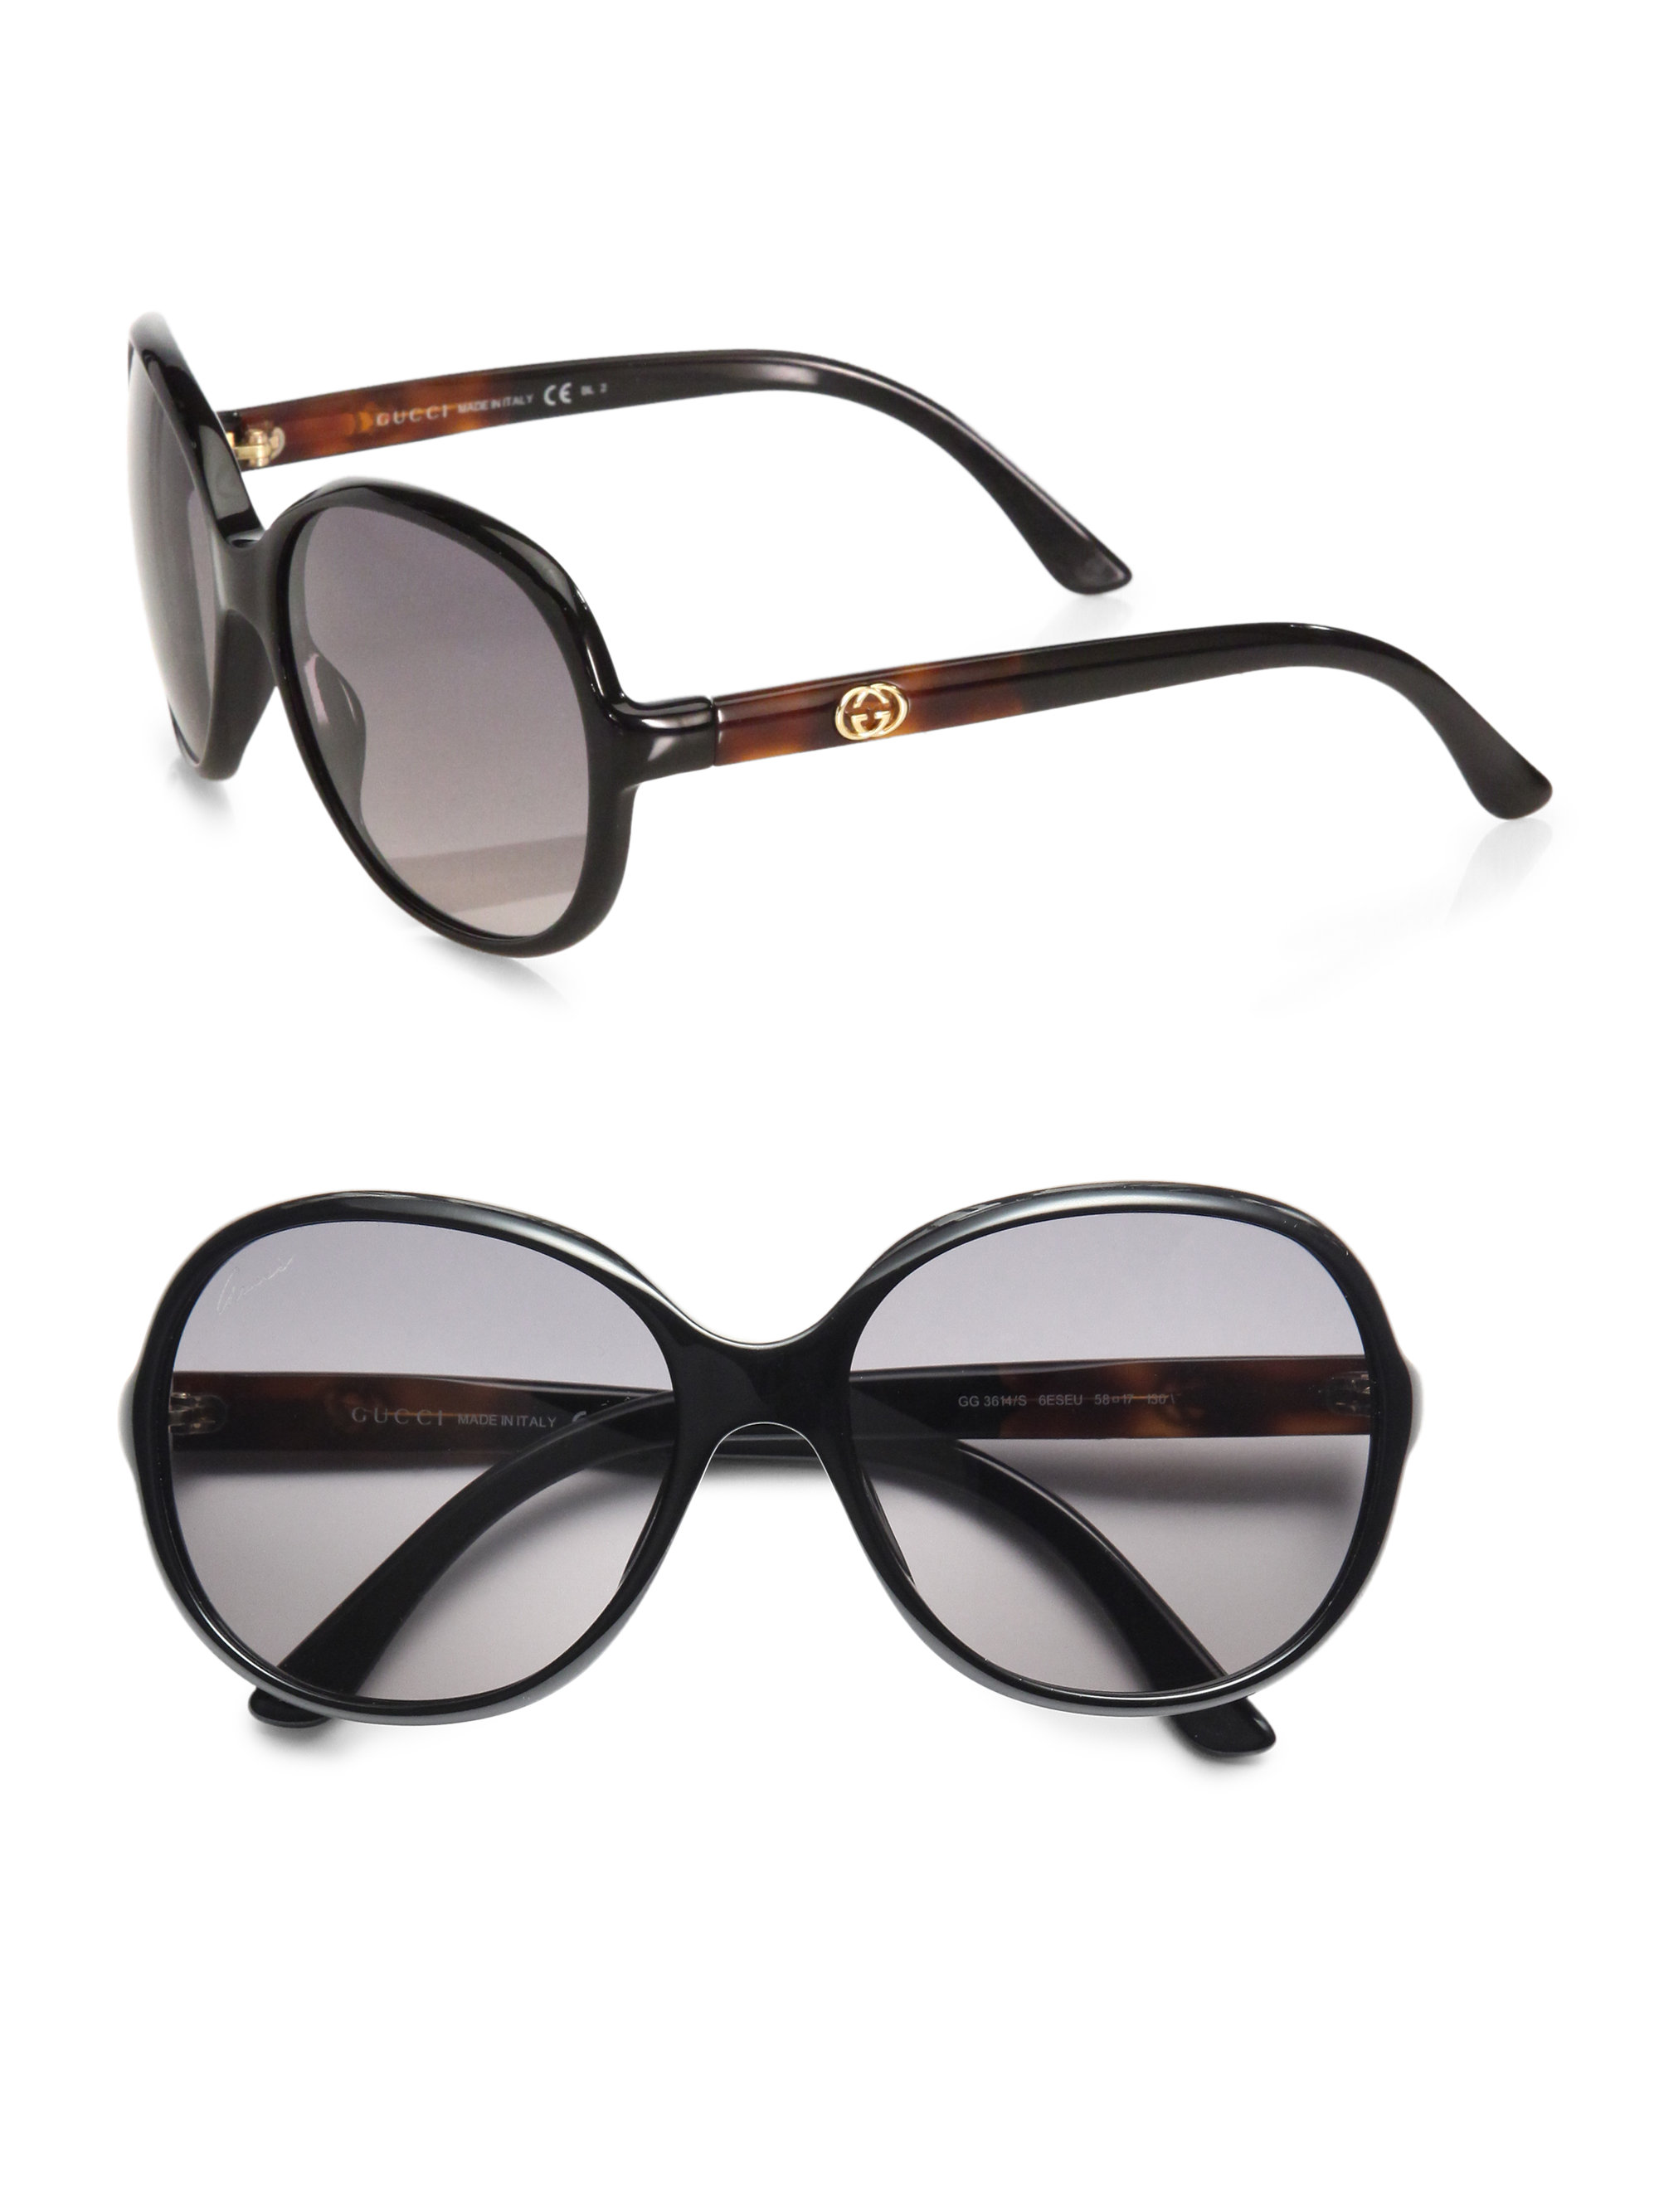 c383f80606e Gucci Womens Rounded Aviator Acetate Sunglasses ✓ Sunglasses Galleries